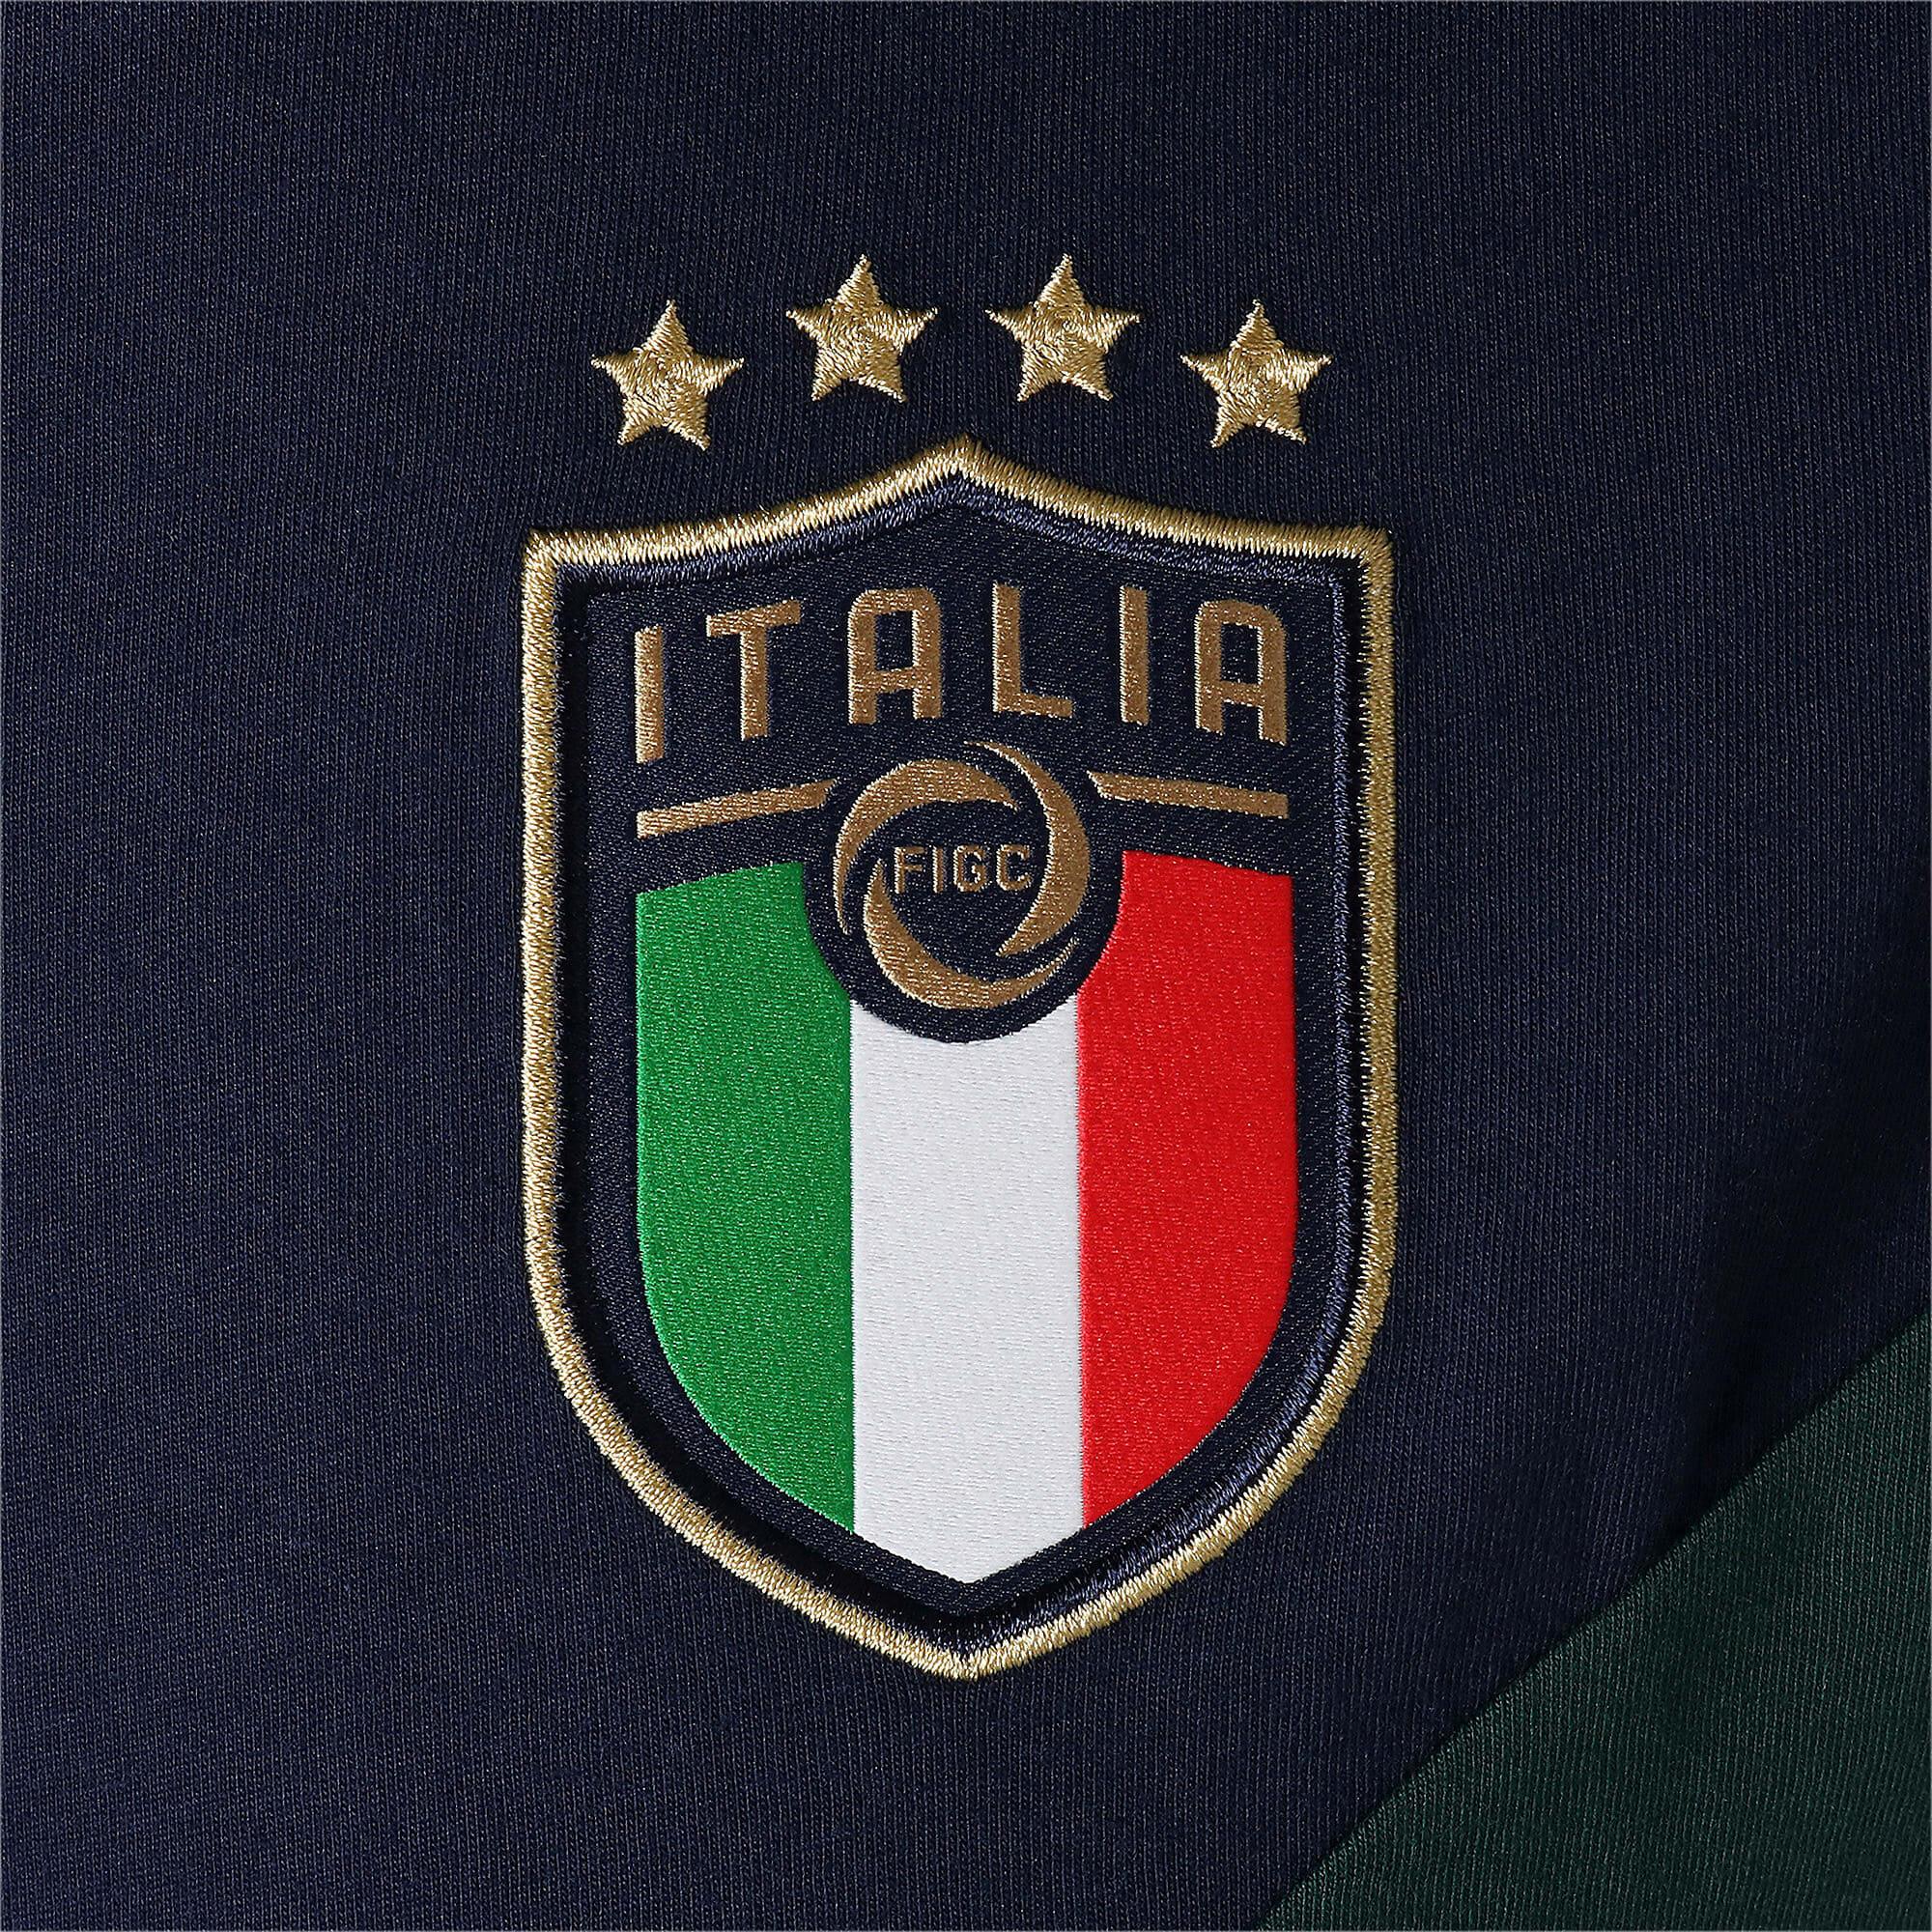 Thumbnail 7 of FIGC イタリア ICONIC MCS Tシャツ 半袖, Ponderosa Pine-peacoat, medium-JPN